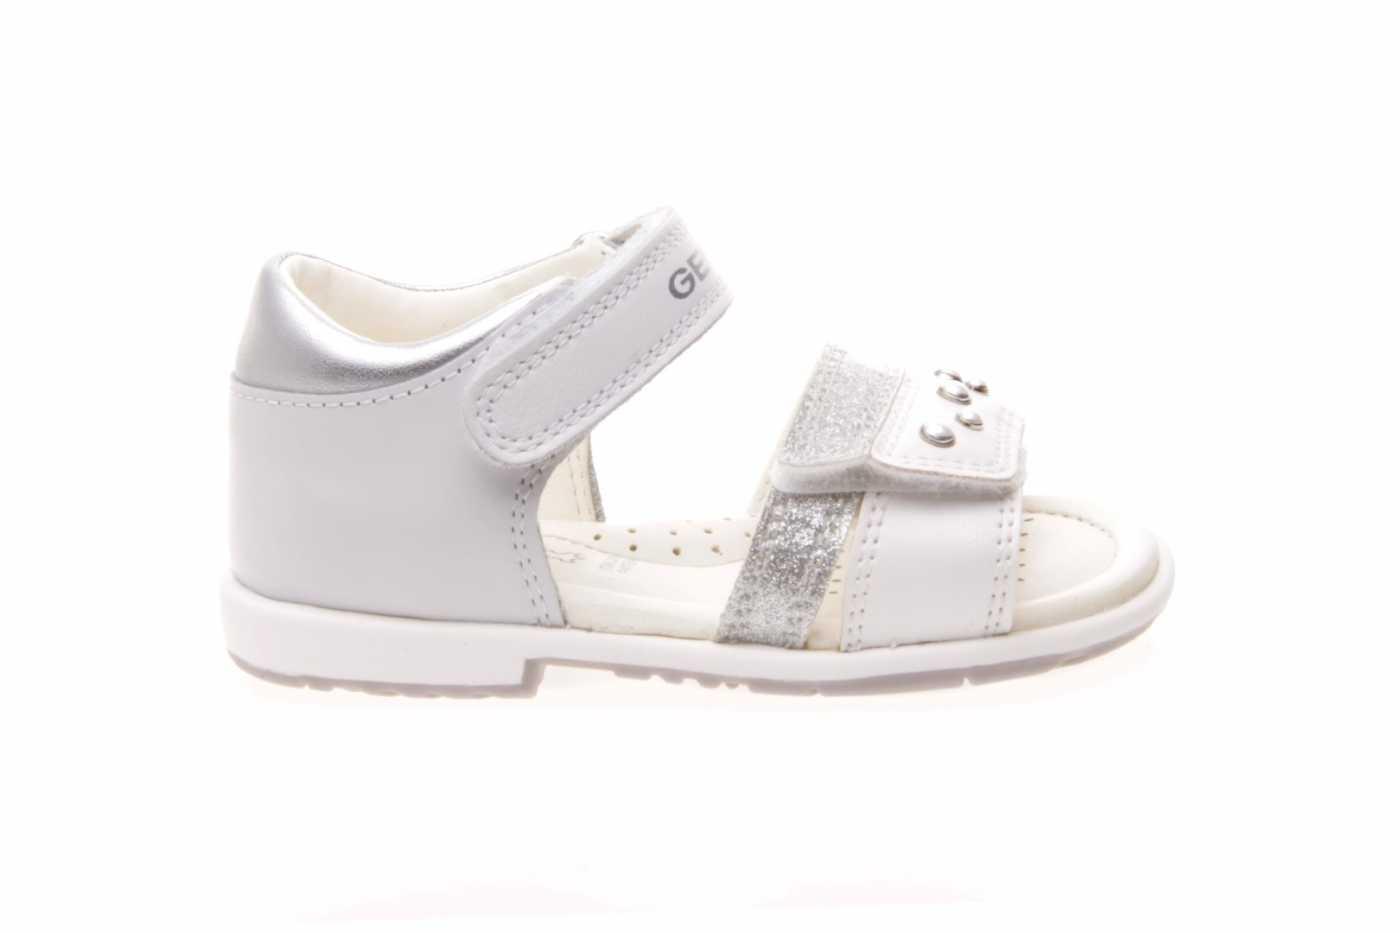 4342dc0f Comprar zapato tipo PREANDANTE NIÑA estilo SANDALIA COLOR BLANCO ...